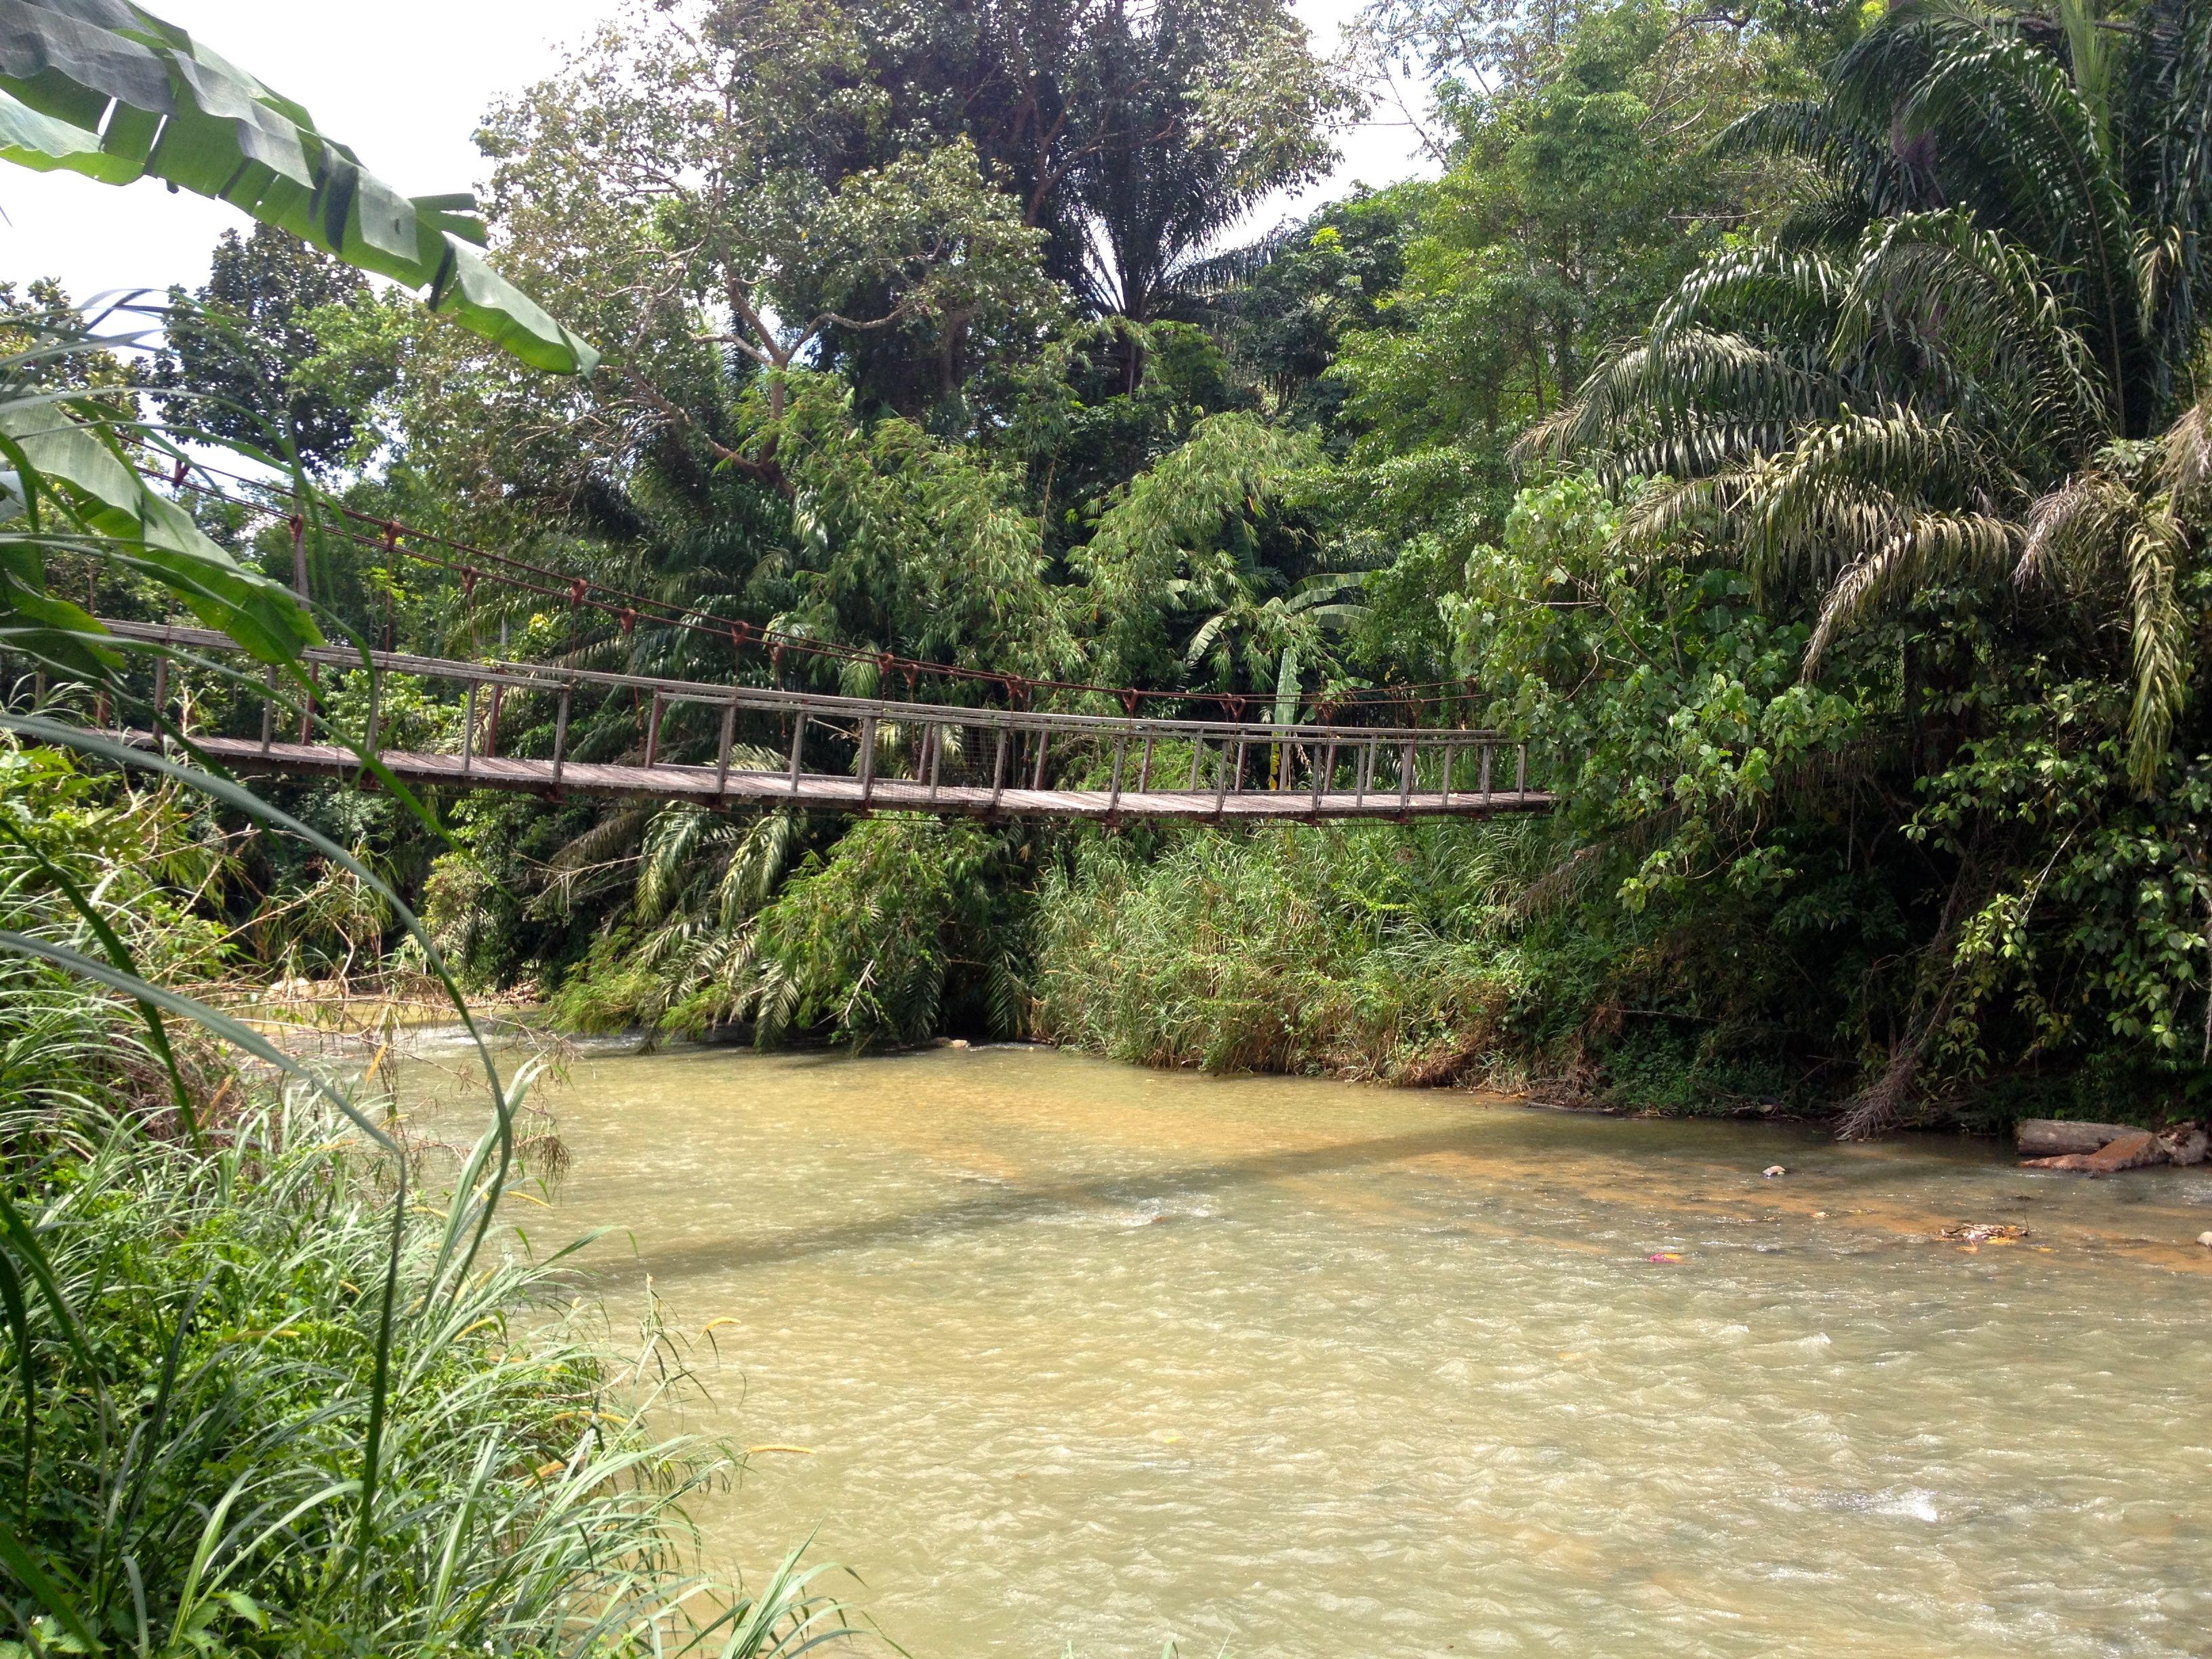 Durian Fiesta Sungai Benus Bridge